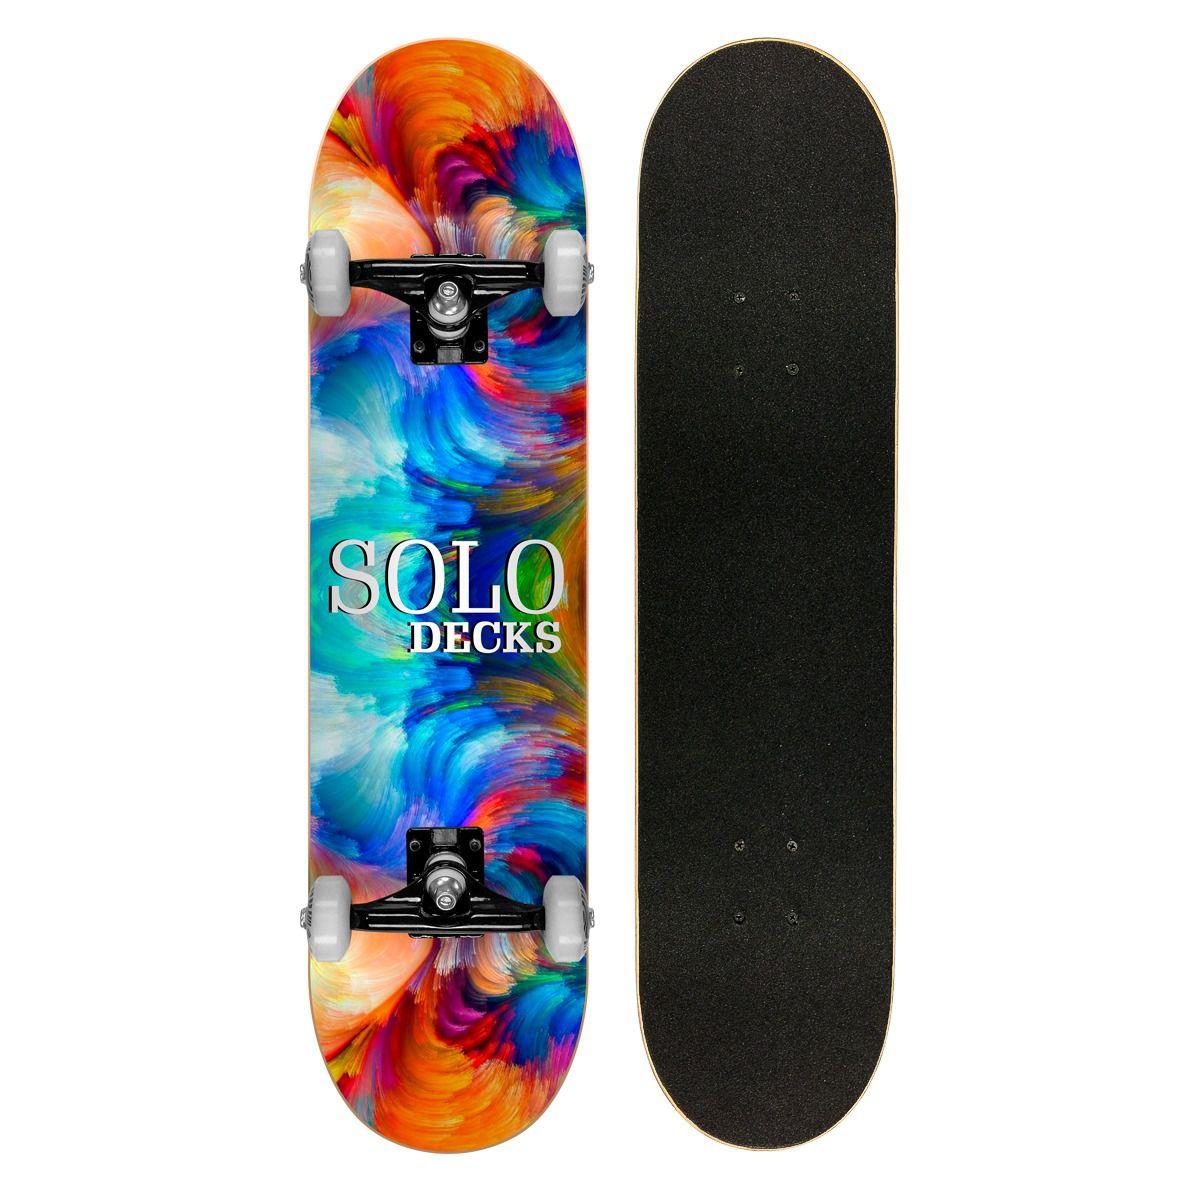 Skate Montado Profissional Solo Decks Mix Color - Até 120kgs